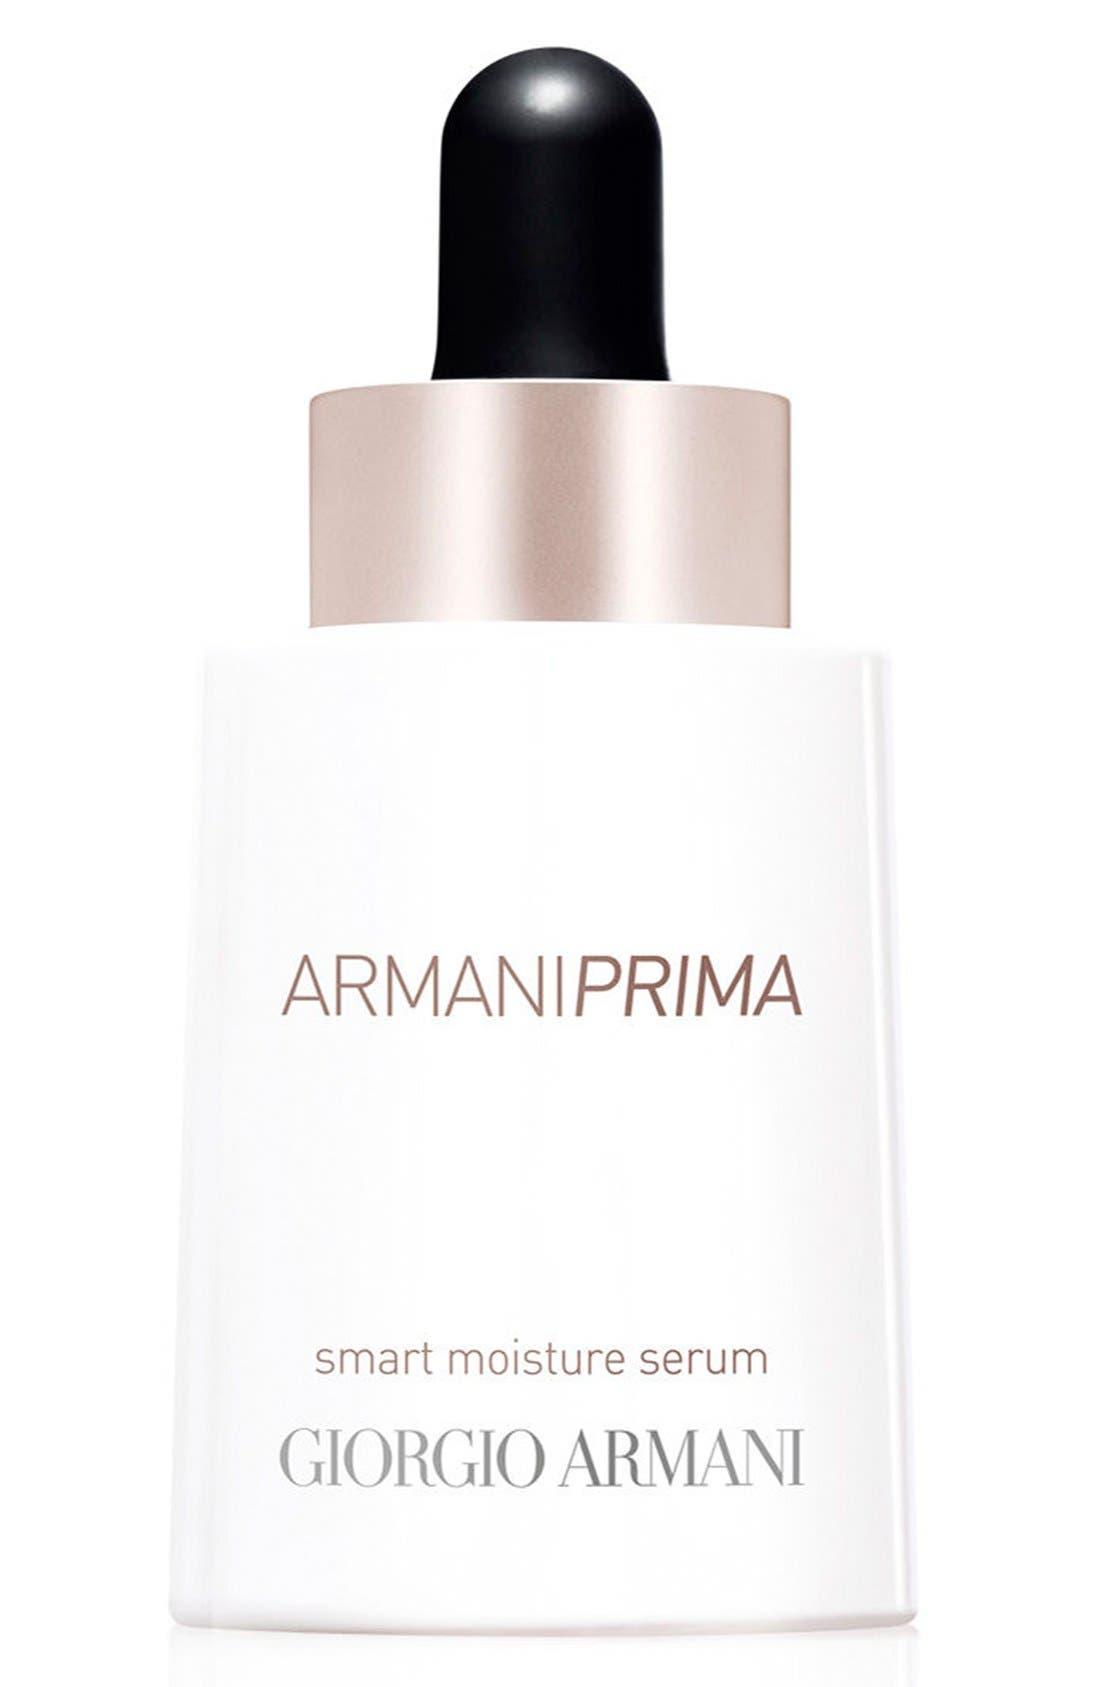 Giorgio Armani 'Prima' Smart Moisture Serum